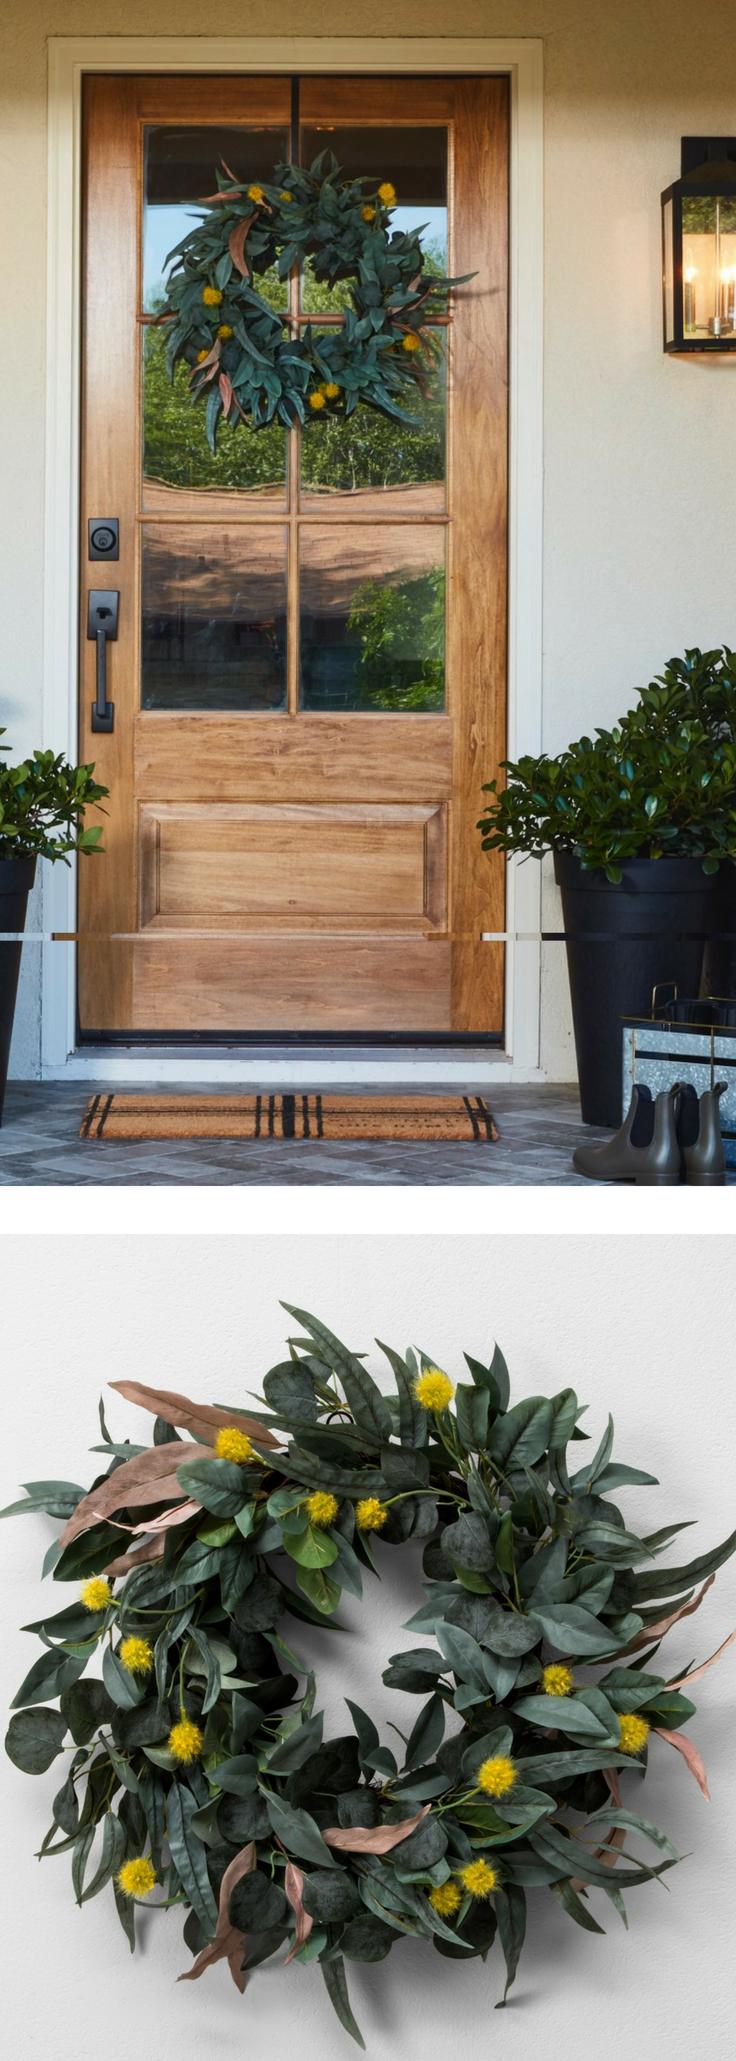 Faux Olive Leaf & Crespedia Wreath Outdoor Décor Fall